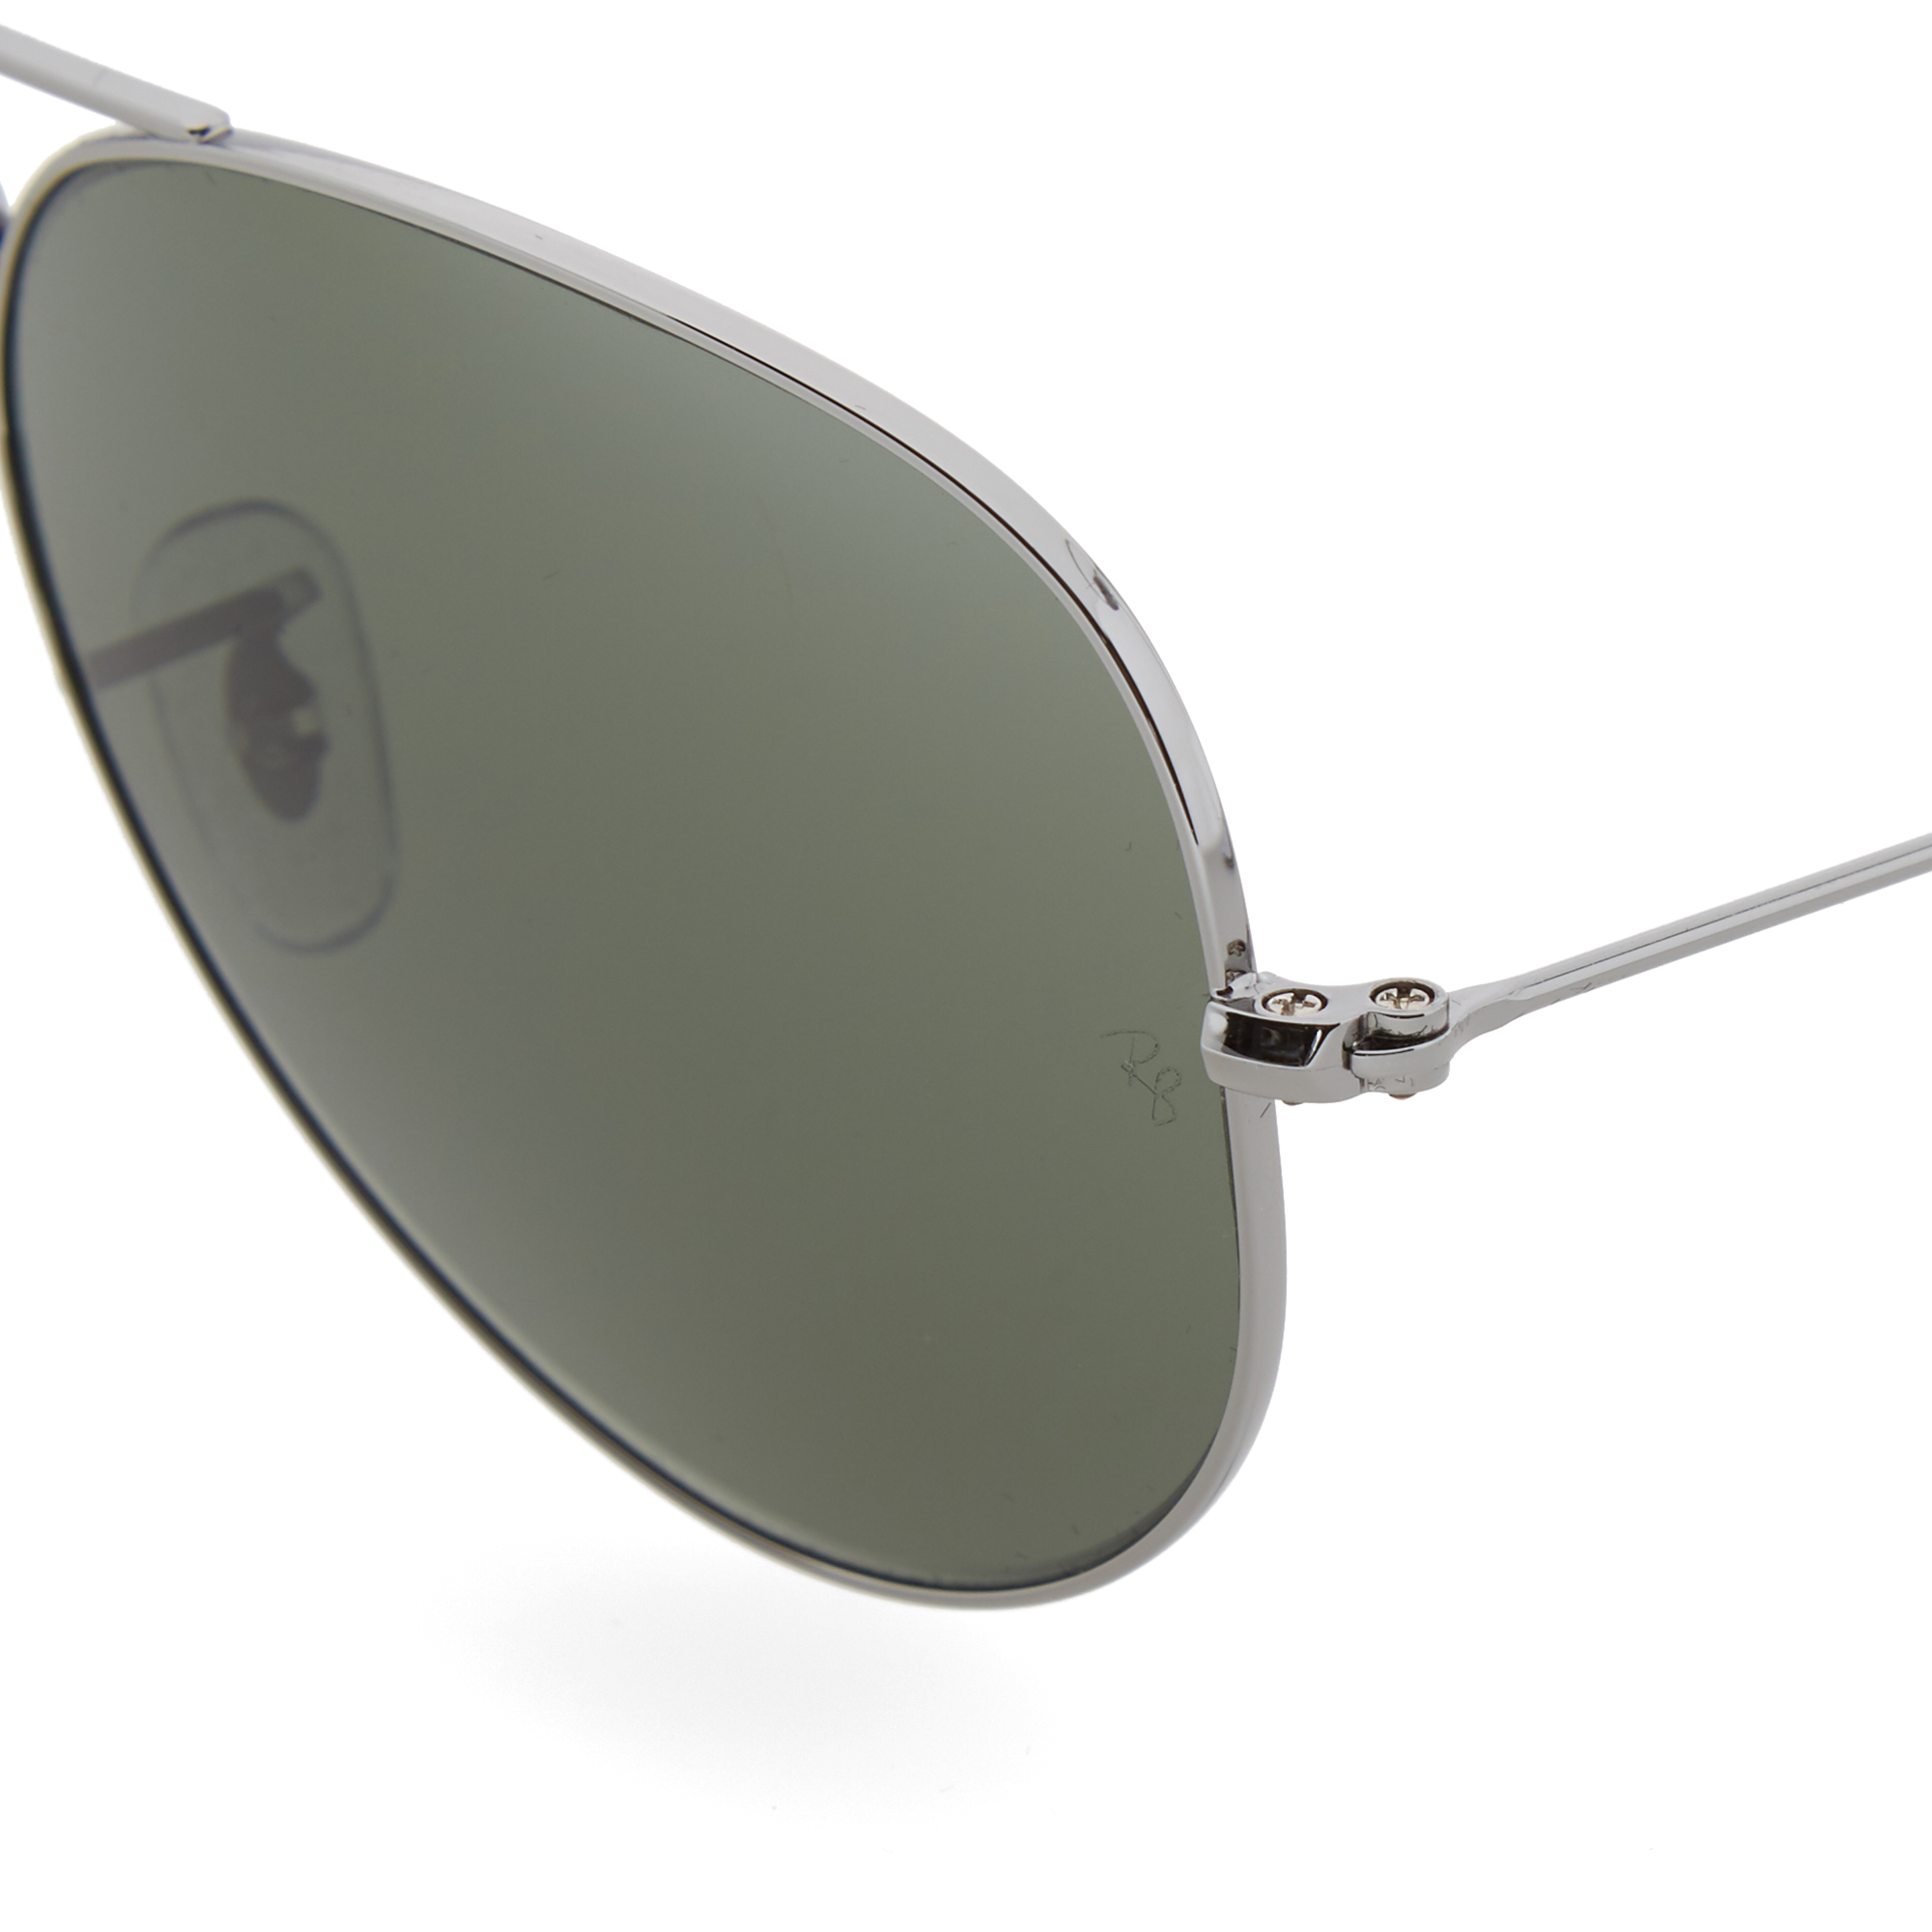 ray ban aviator sunglasses duty free